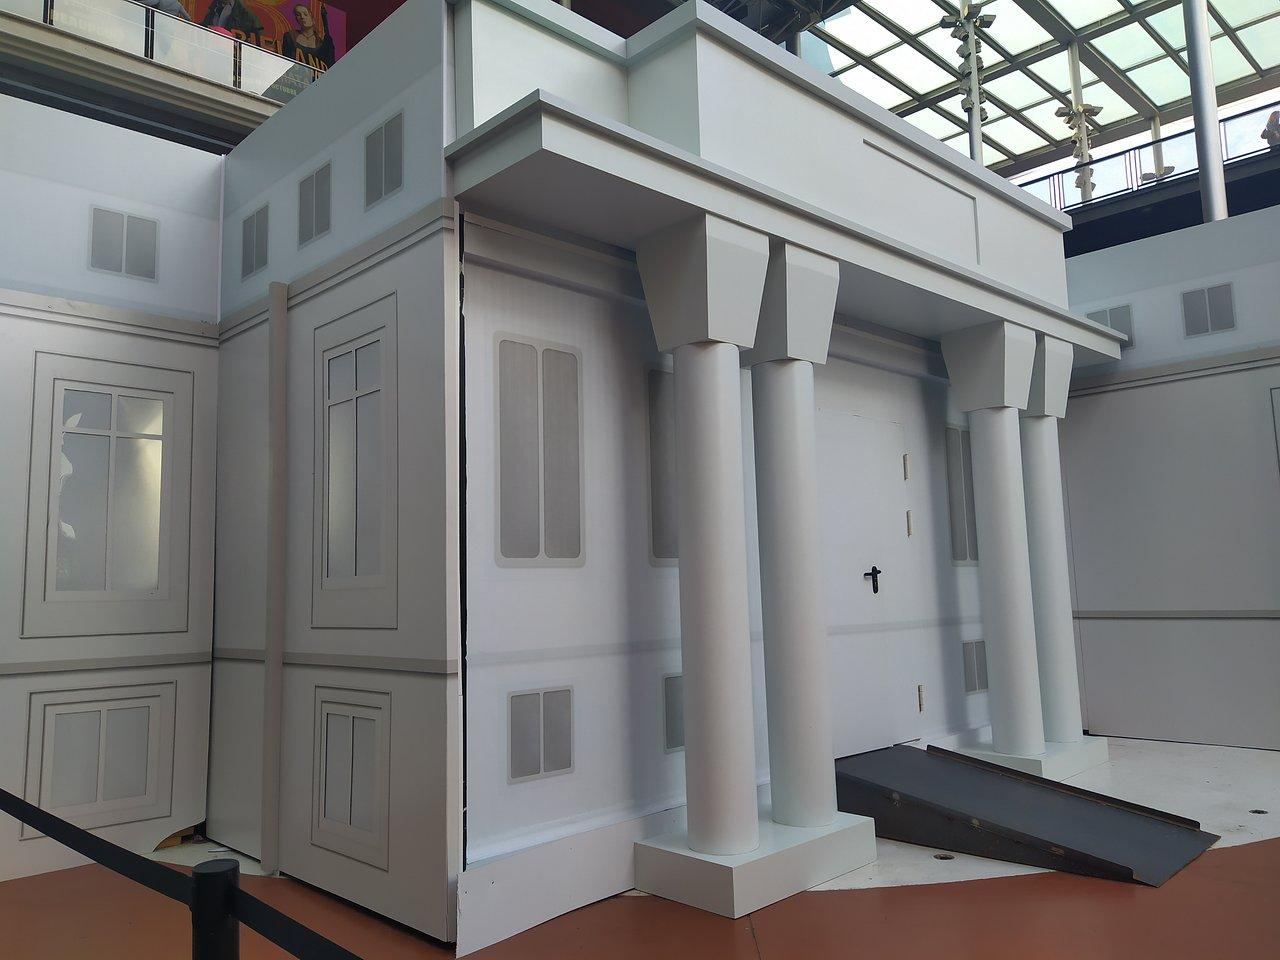 Piano Bar Per Casa la casa de papel (madrid) - 2020 all you need to know before